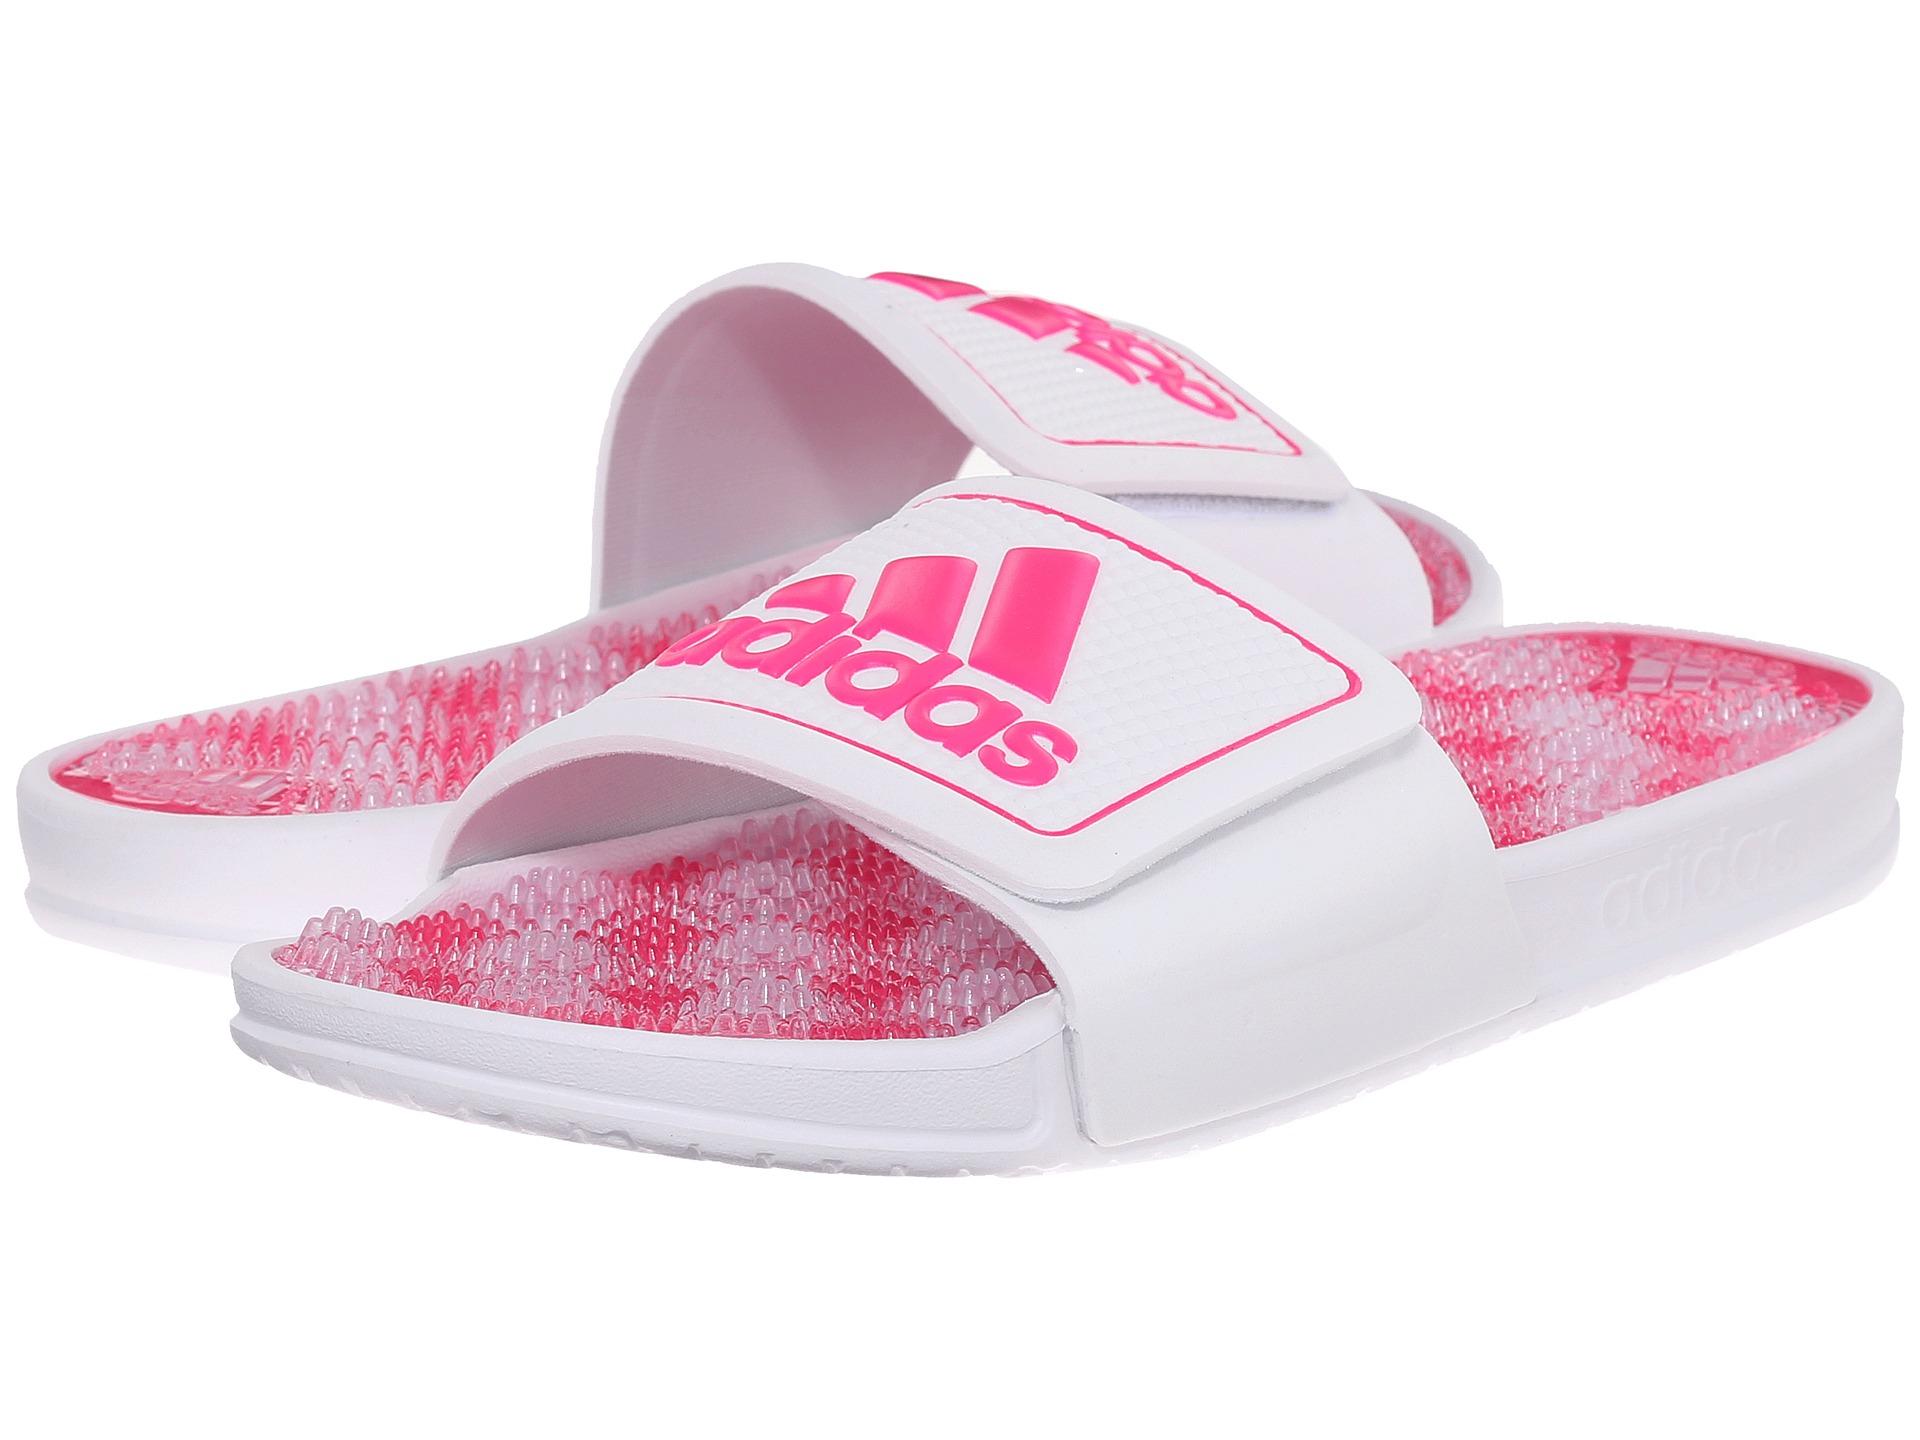 Lyst - adidas Originals Adissage 2.0 Logo in White 7c8a5b597